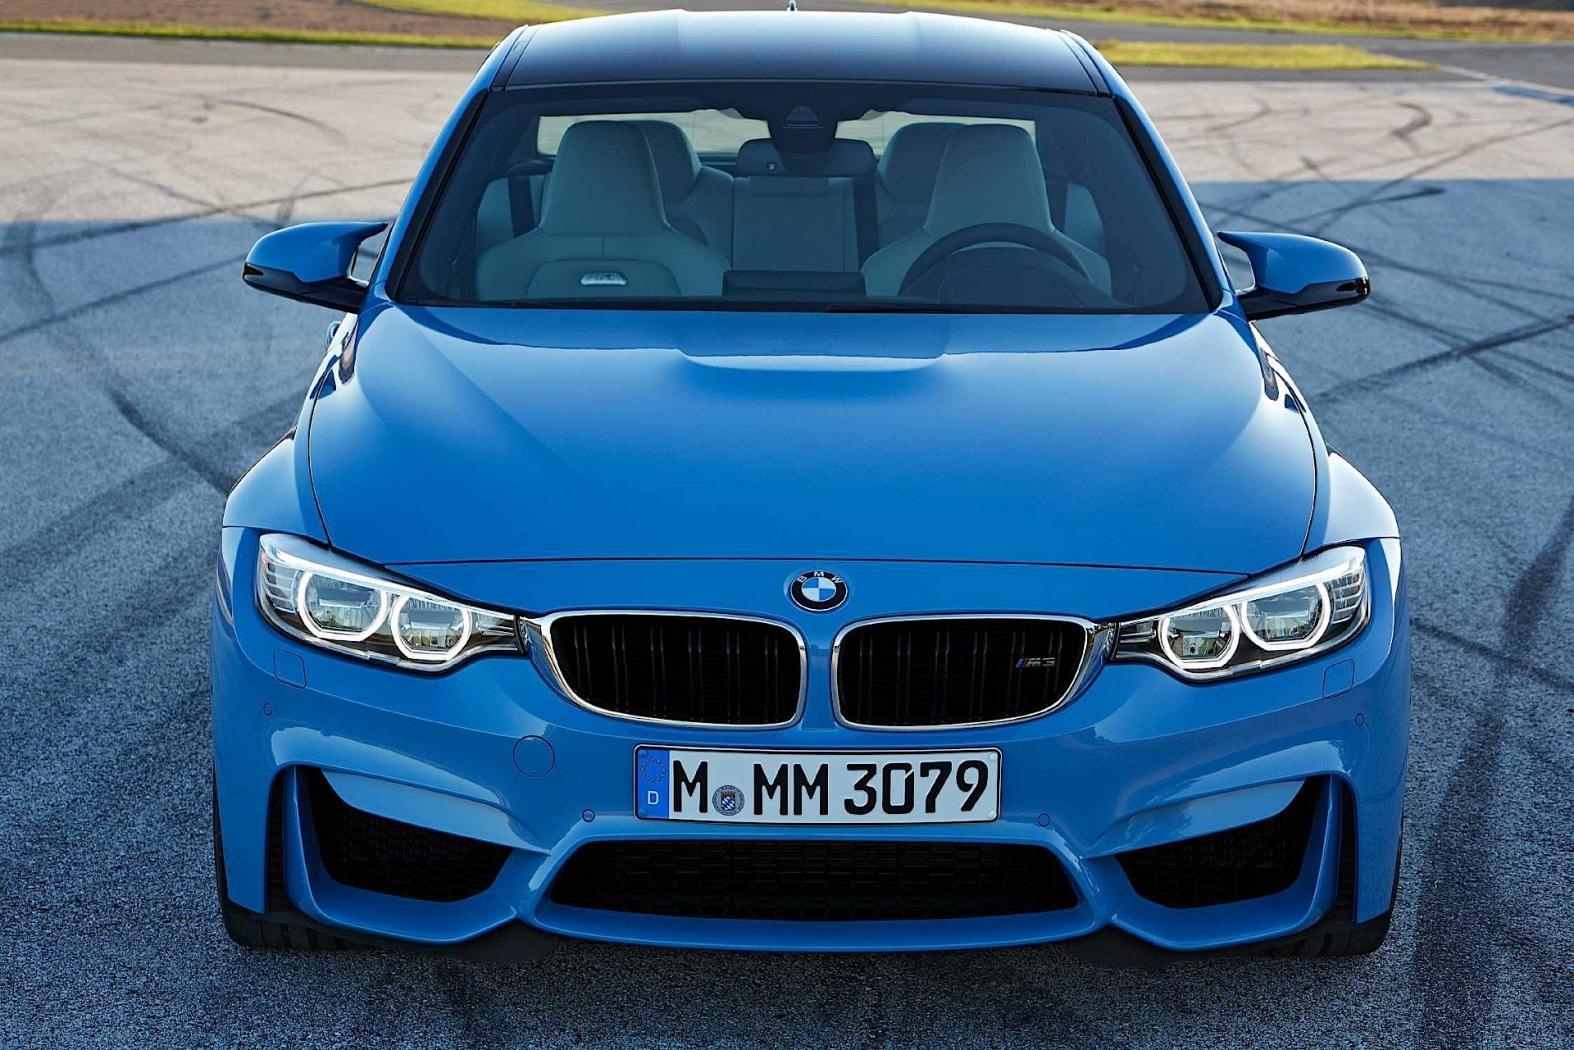 Fiche-occasion-BMW-M3-F80-6.jpeg